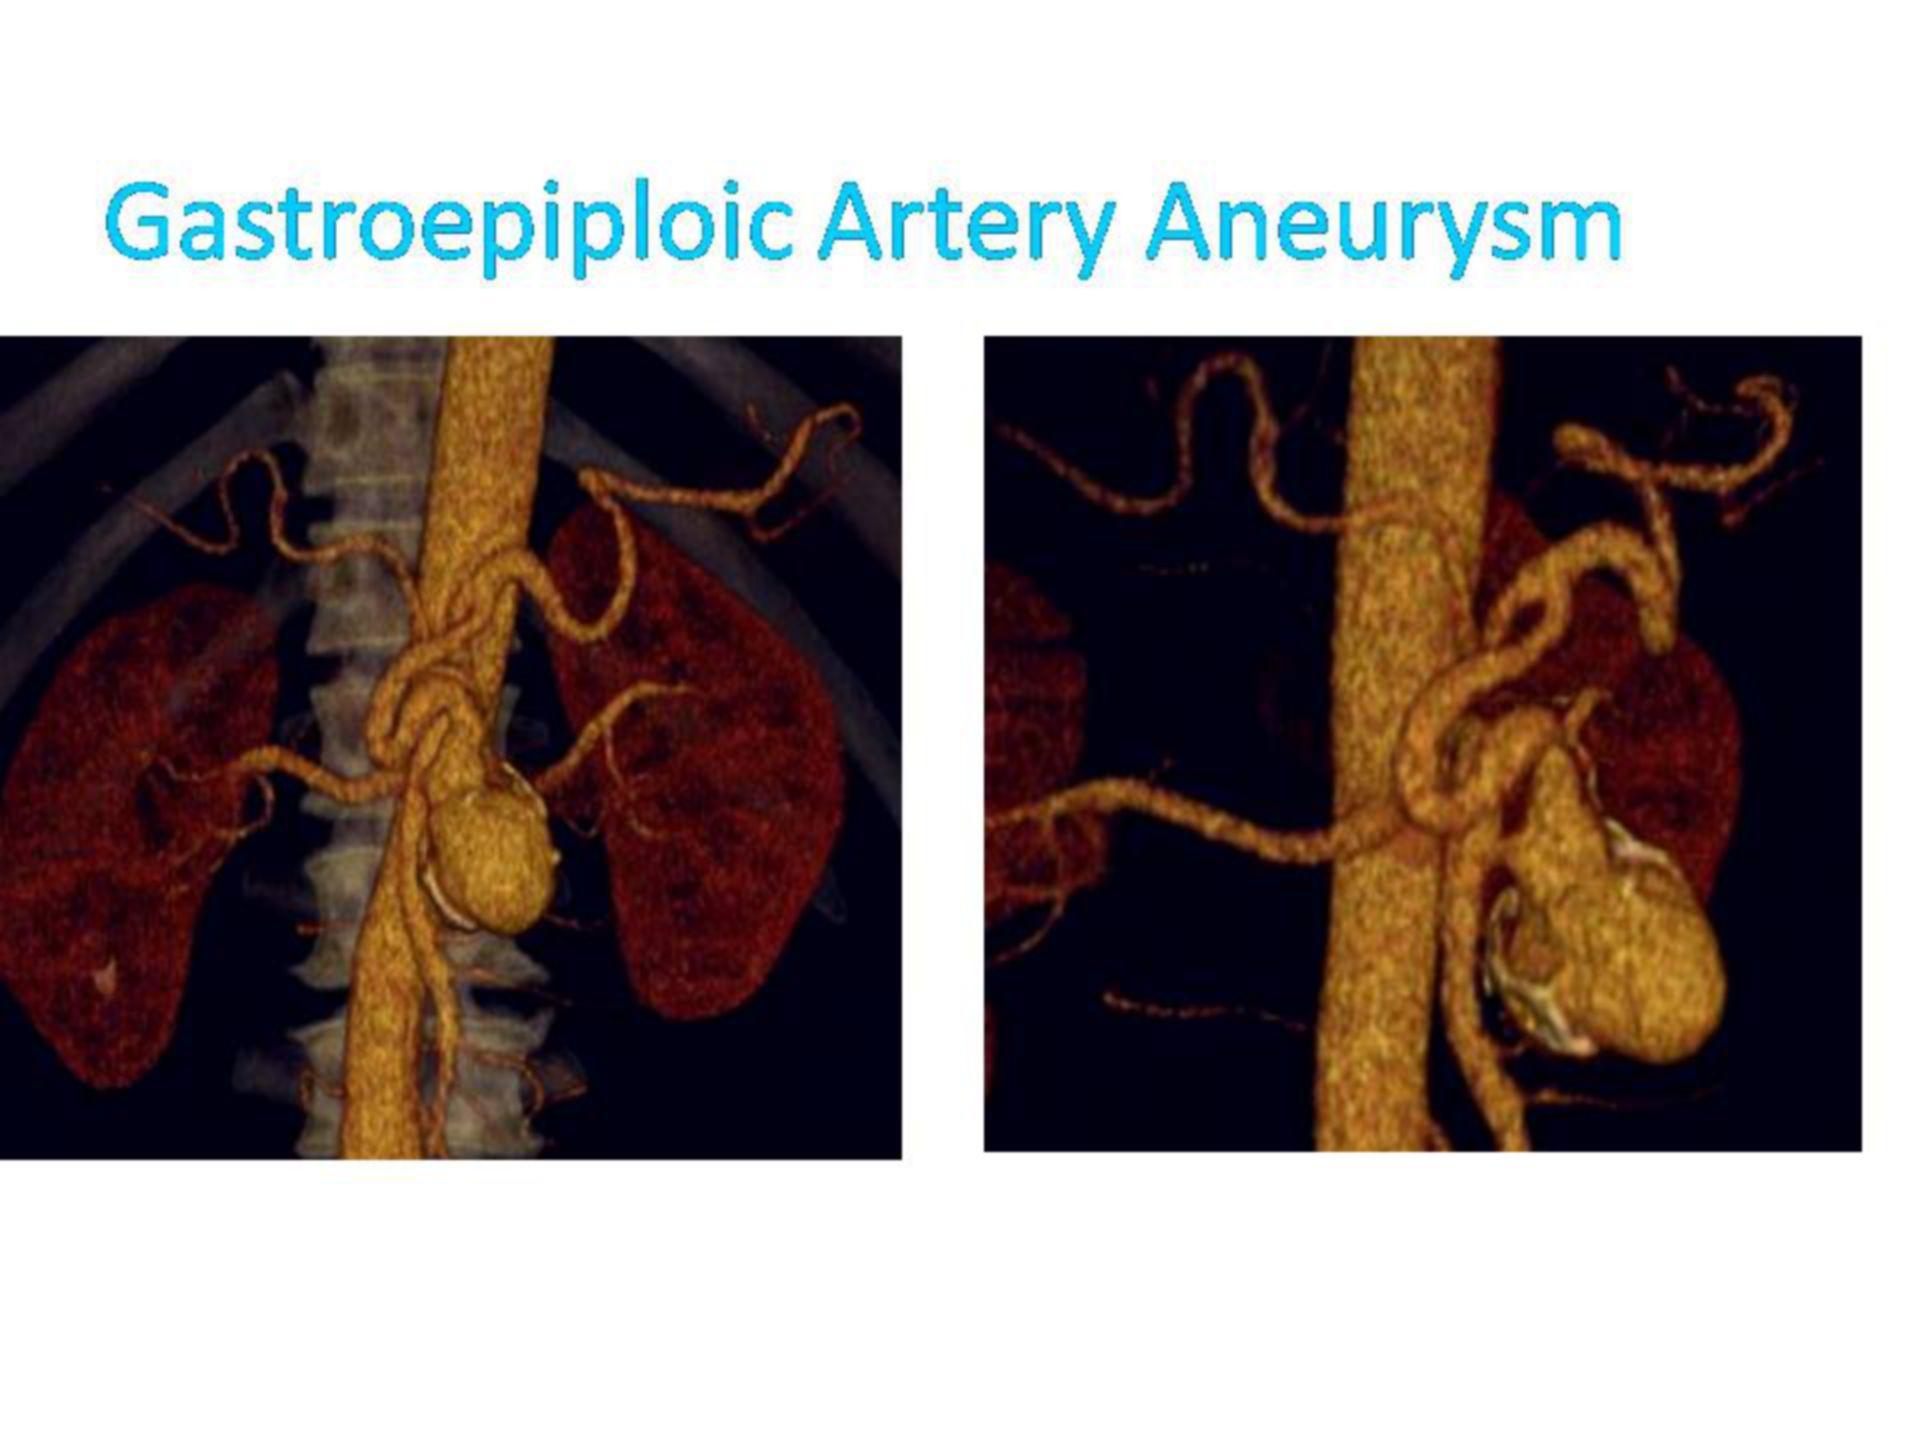 Gastroepiploic artery aneurysm (2)